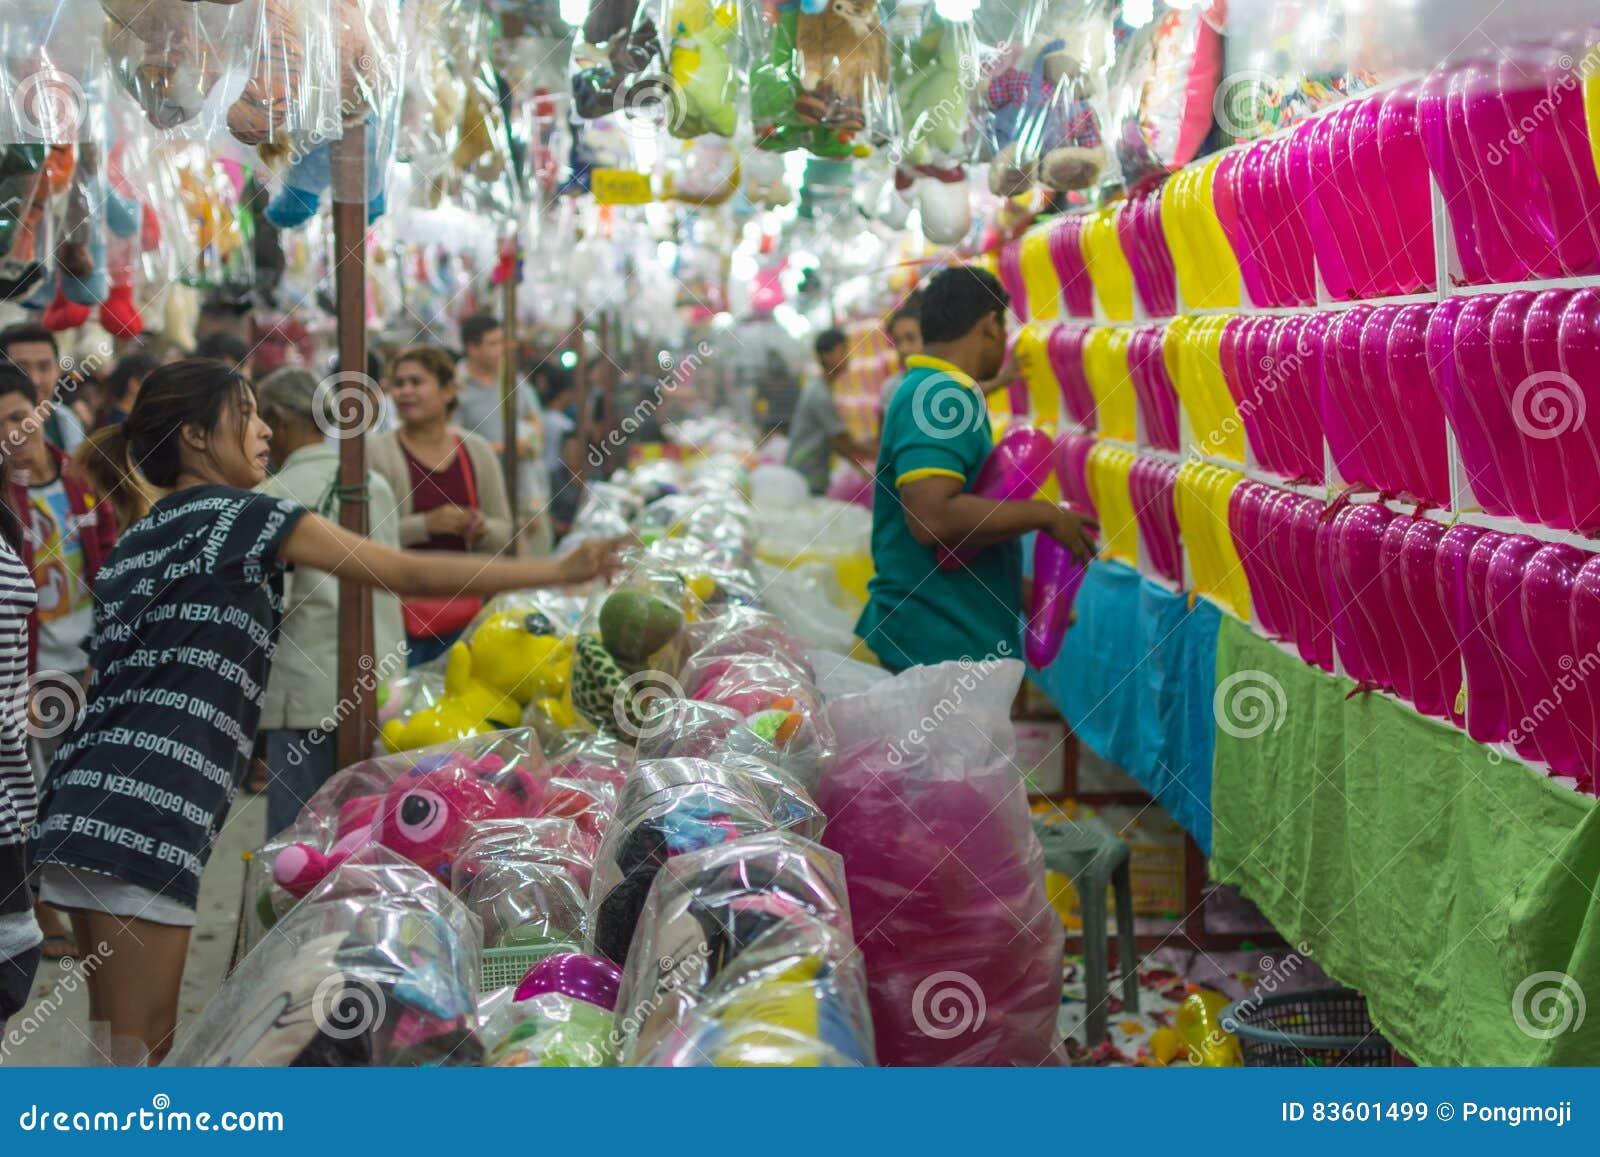 Balloon Darts Game In A Temple Festival Carnival Editorial Stock